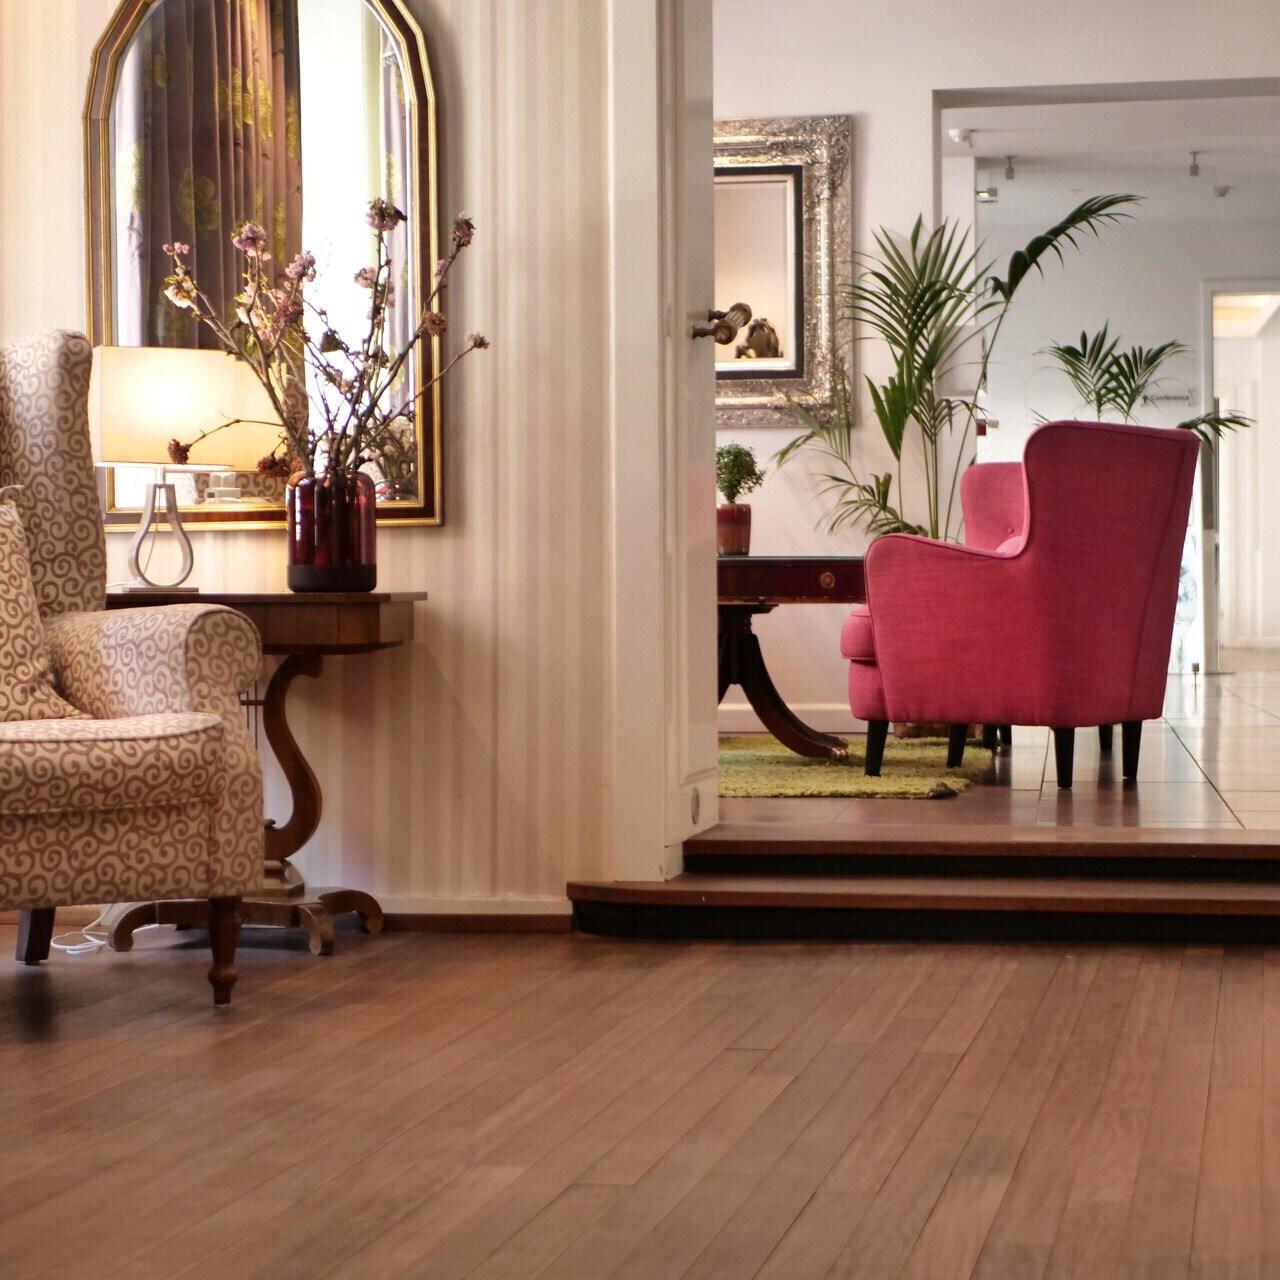 5 reasons to stay at Hotel Mayfair Copenhagen